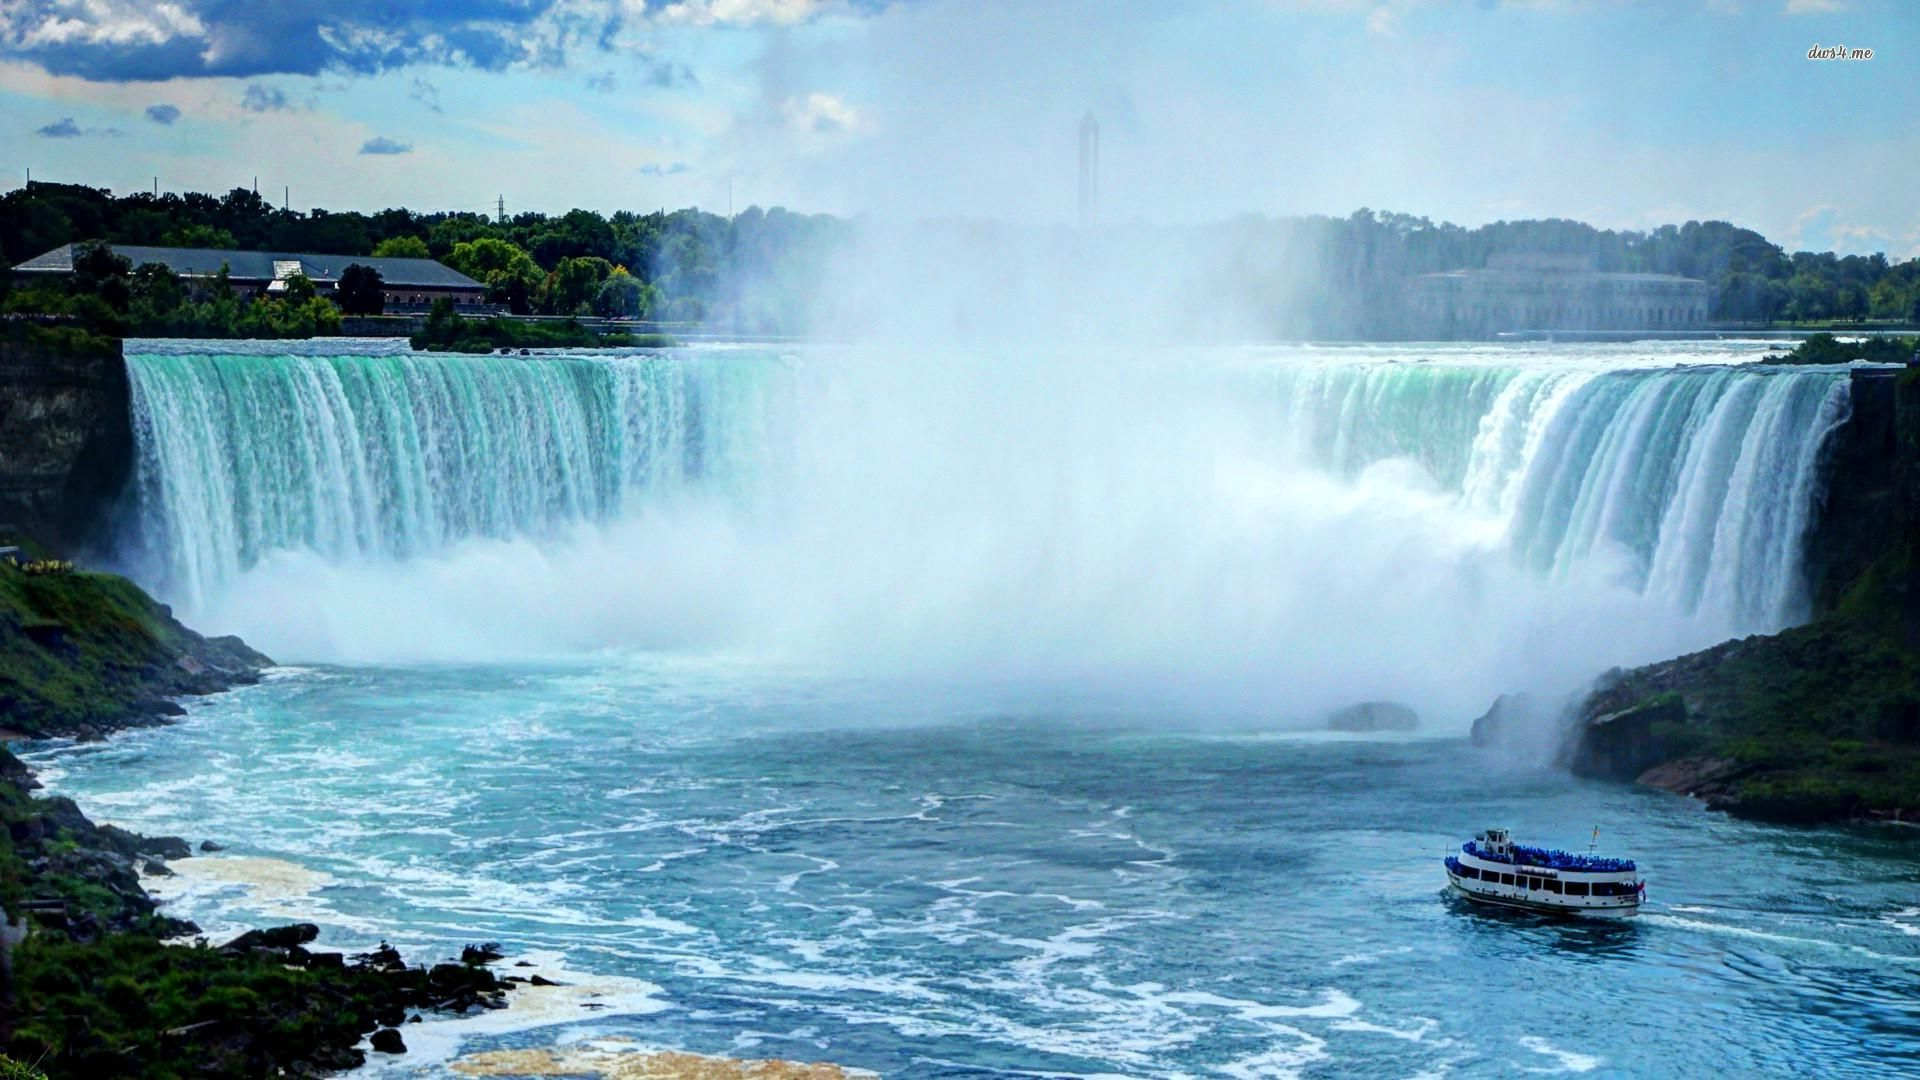 Niagara Falls wallpaper 1280x800 Niagara Falls wallpaper 1366x768 1920x1080